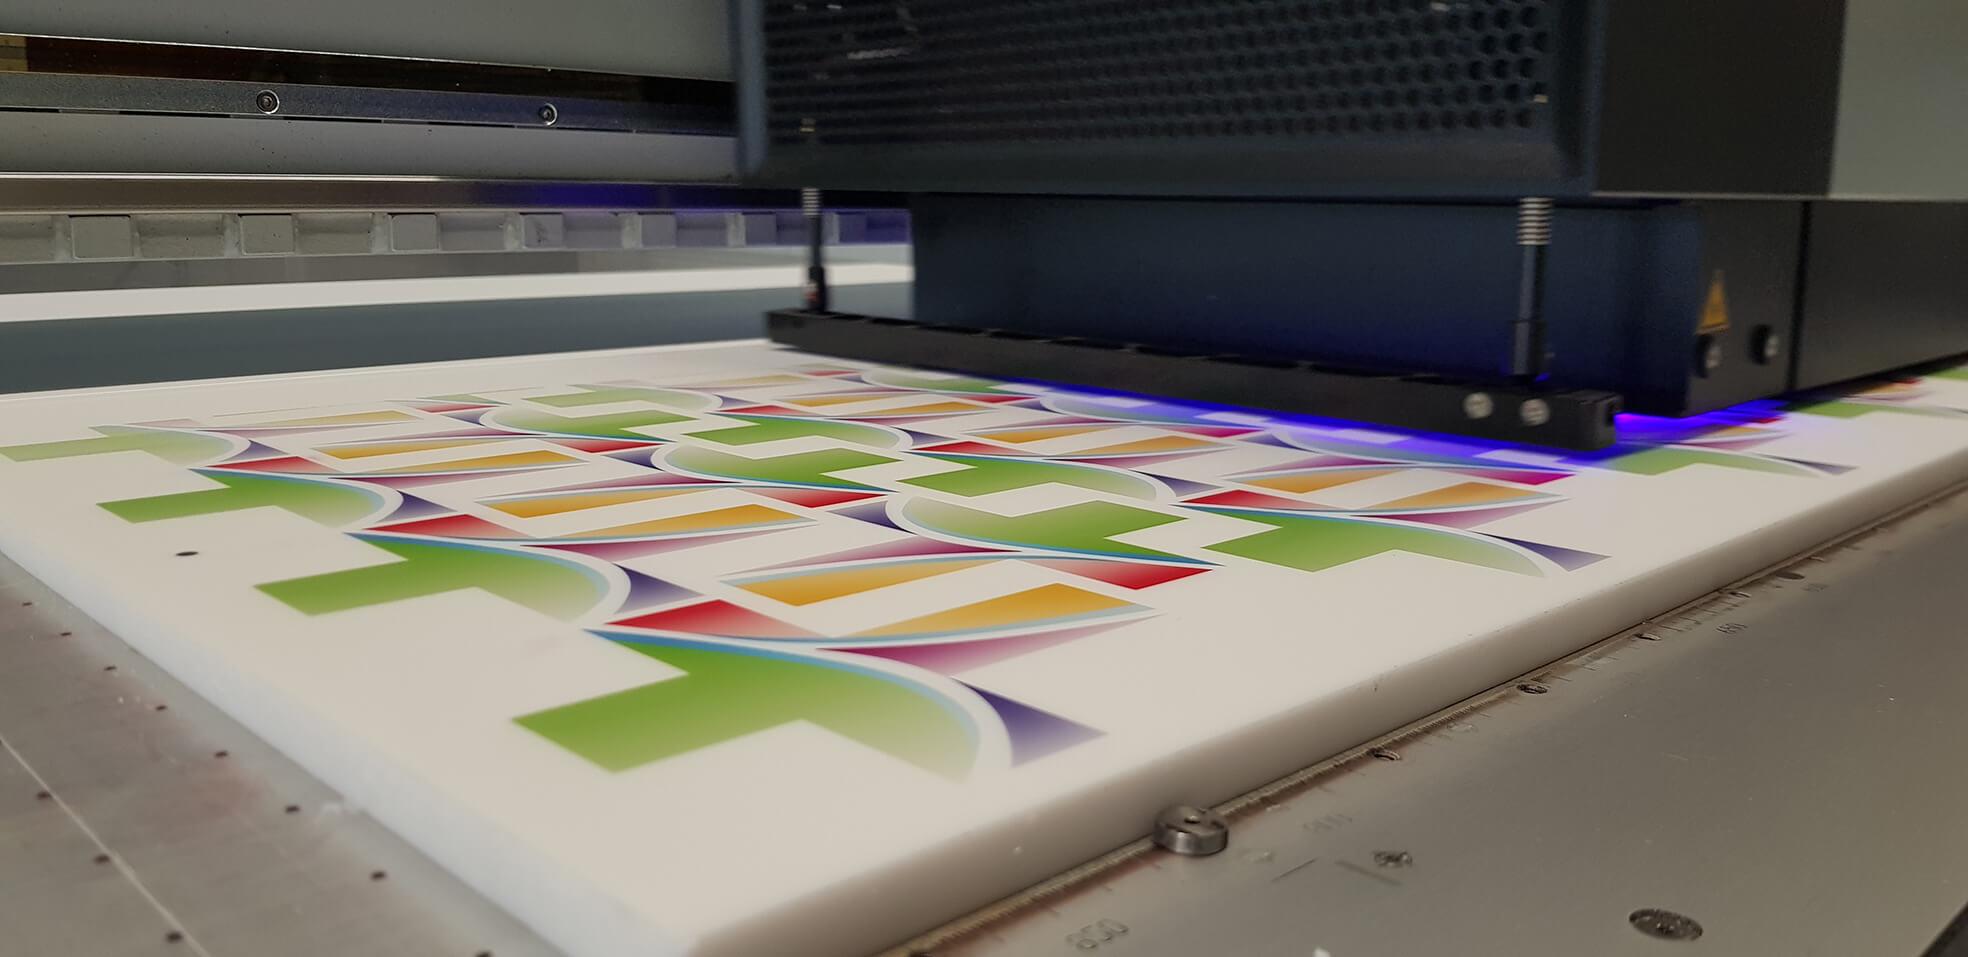 530-Werbemittel-Acrylglas-Plexiglas-Plattendirektdruck-UV-Druck